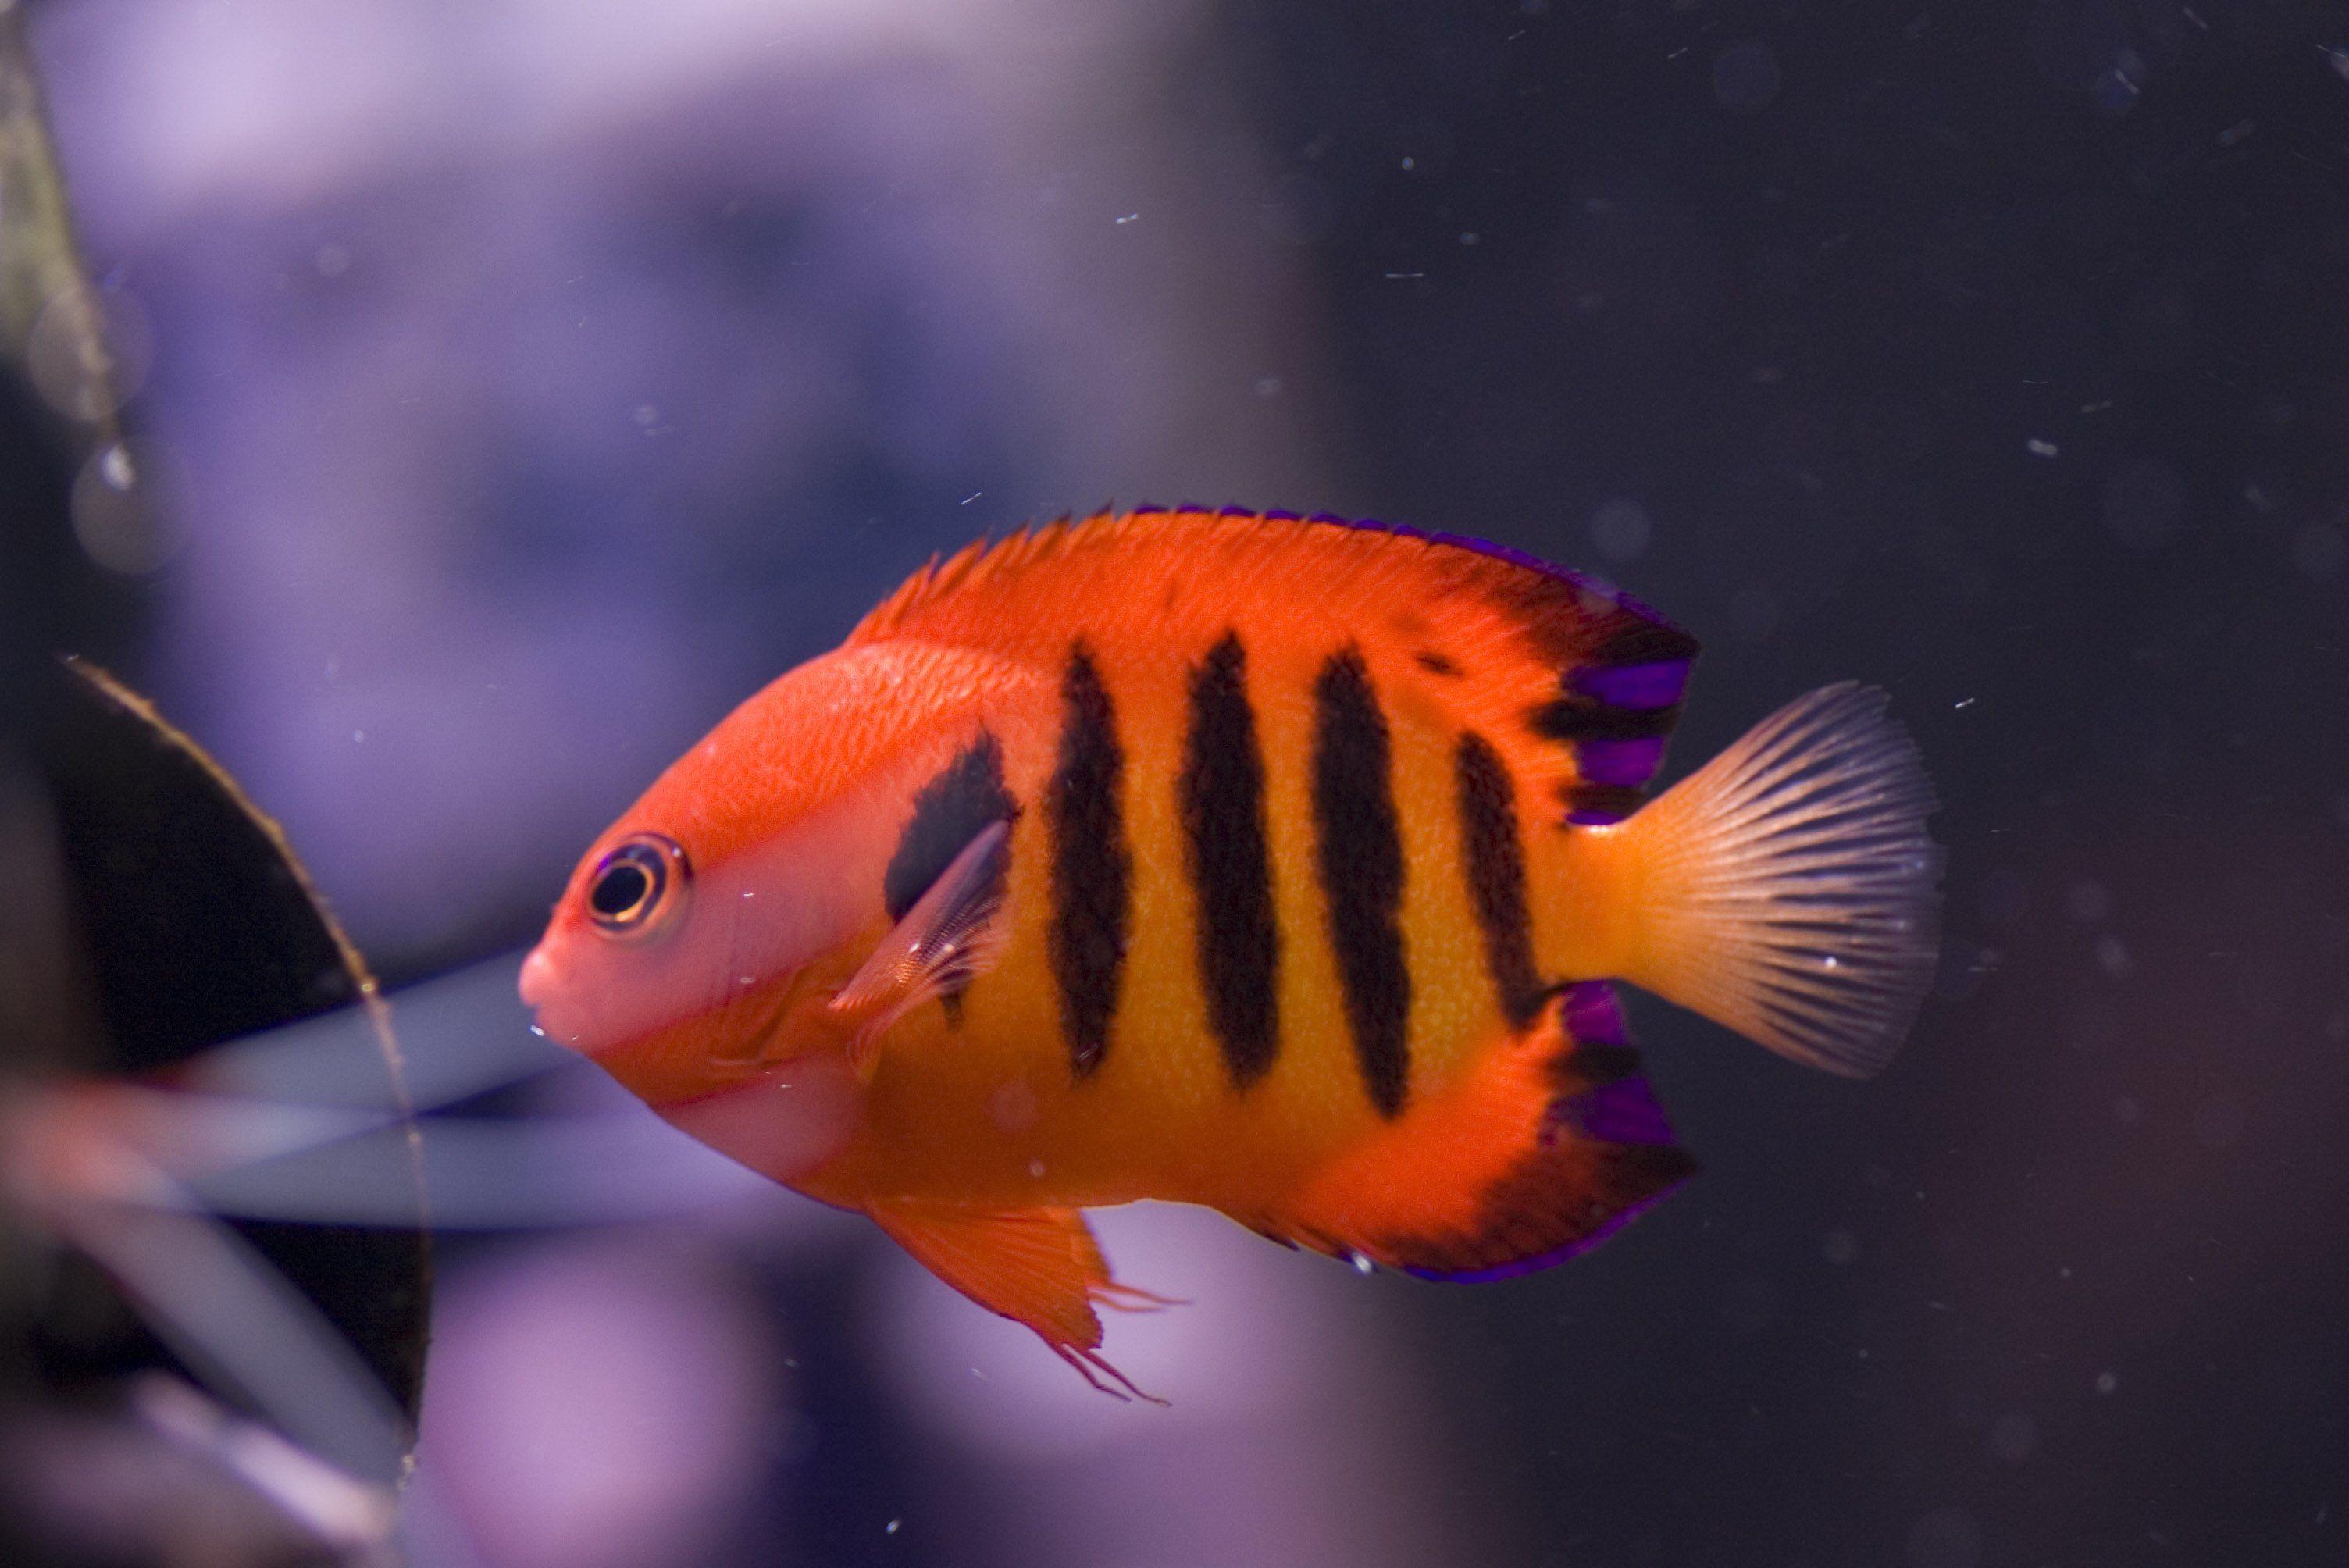 Pin by April Philpot on Aquariums & Fish | Pinterest | Angelfish ...